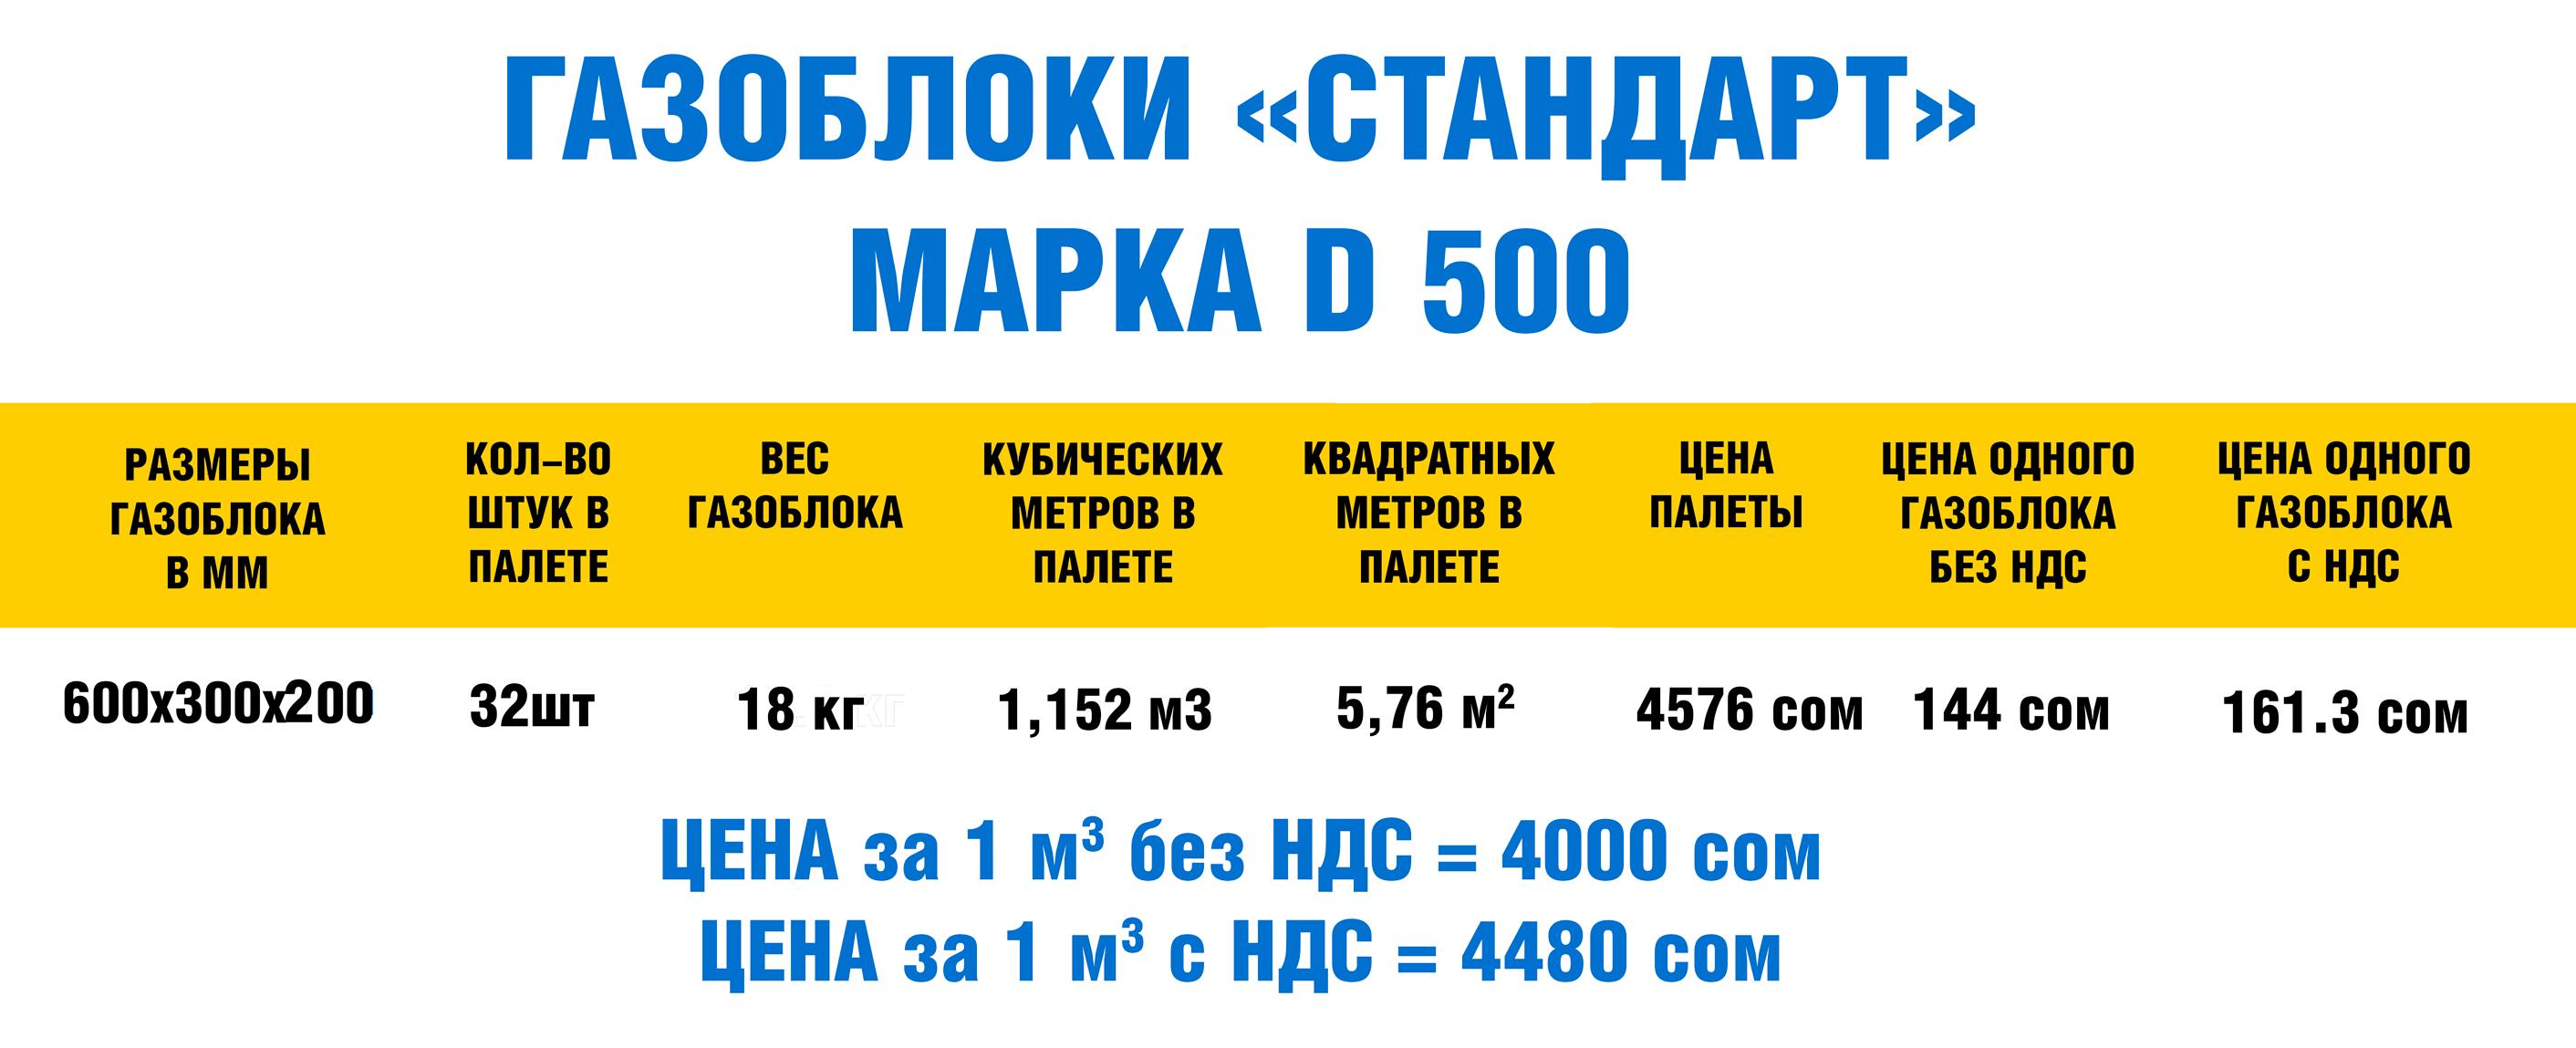 Д-500